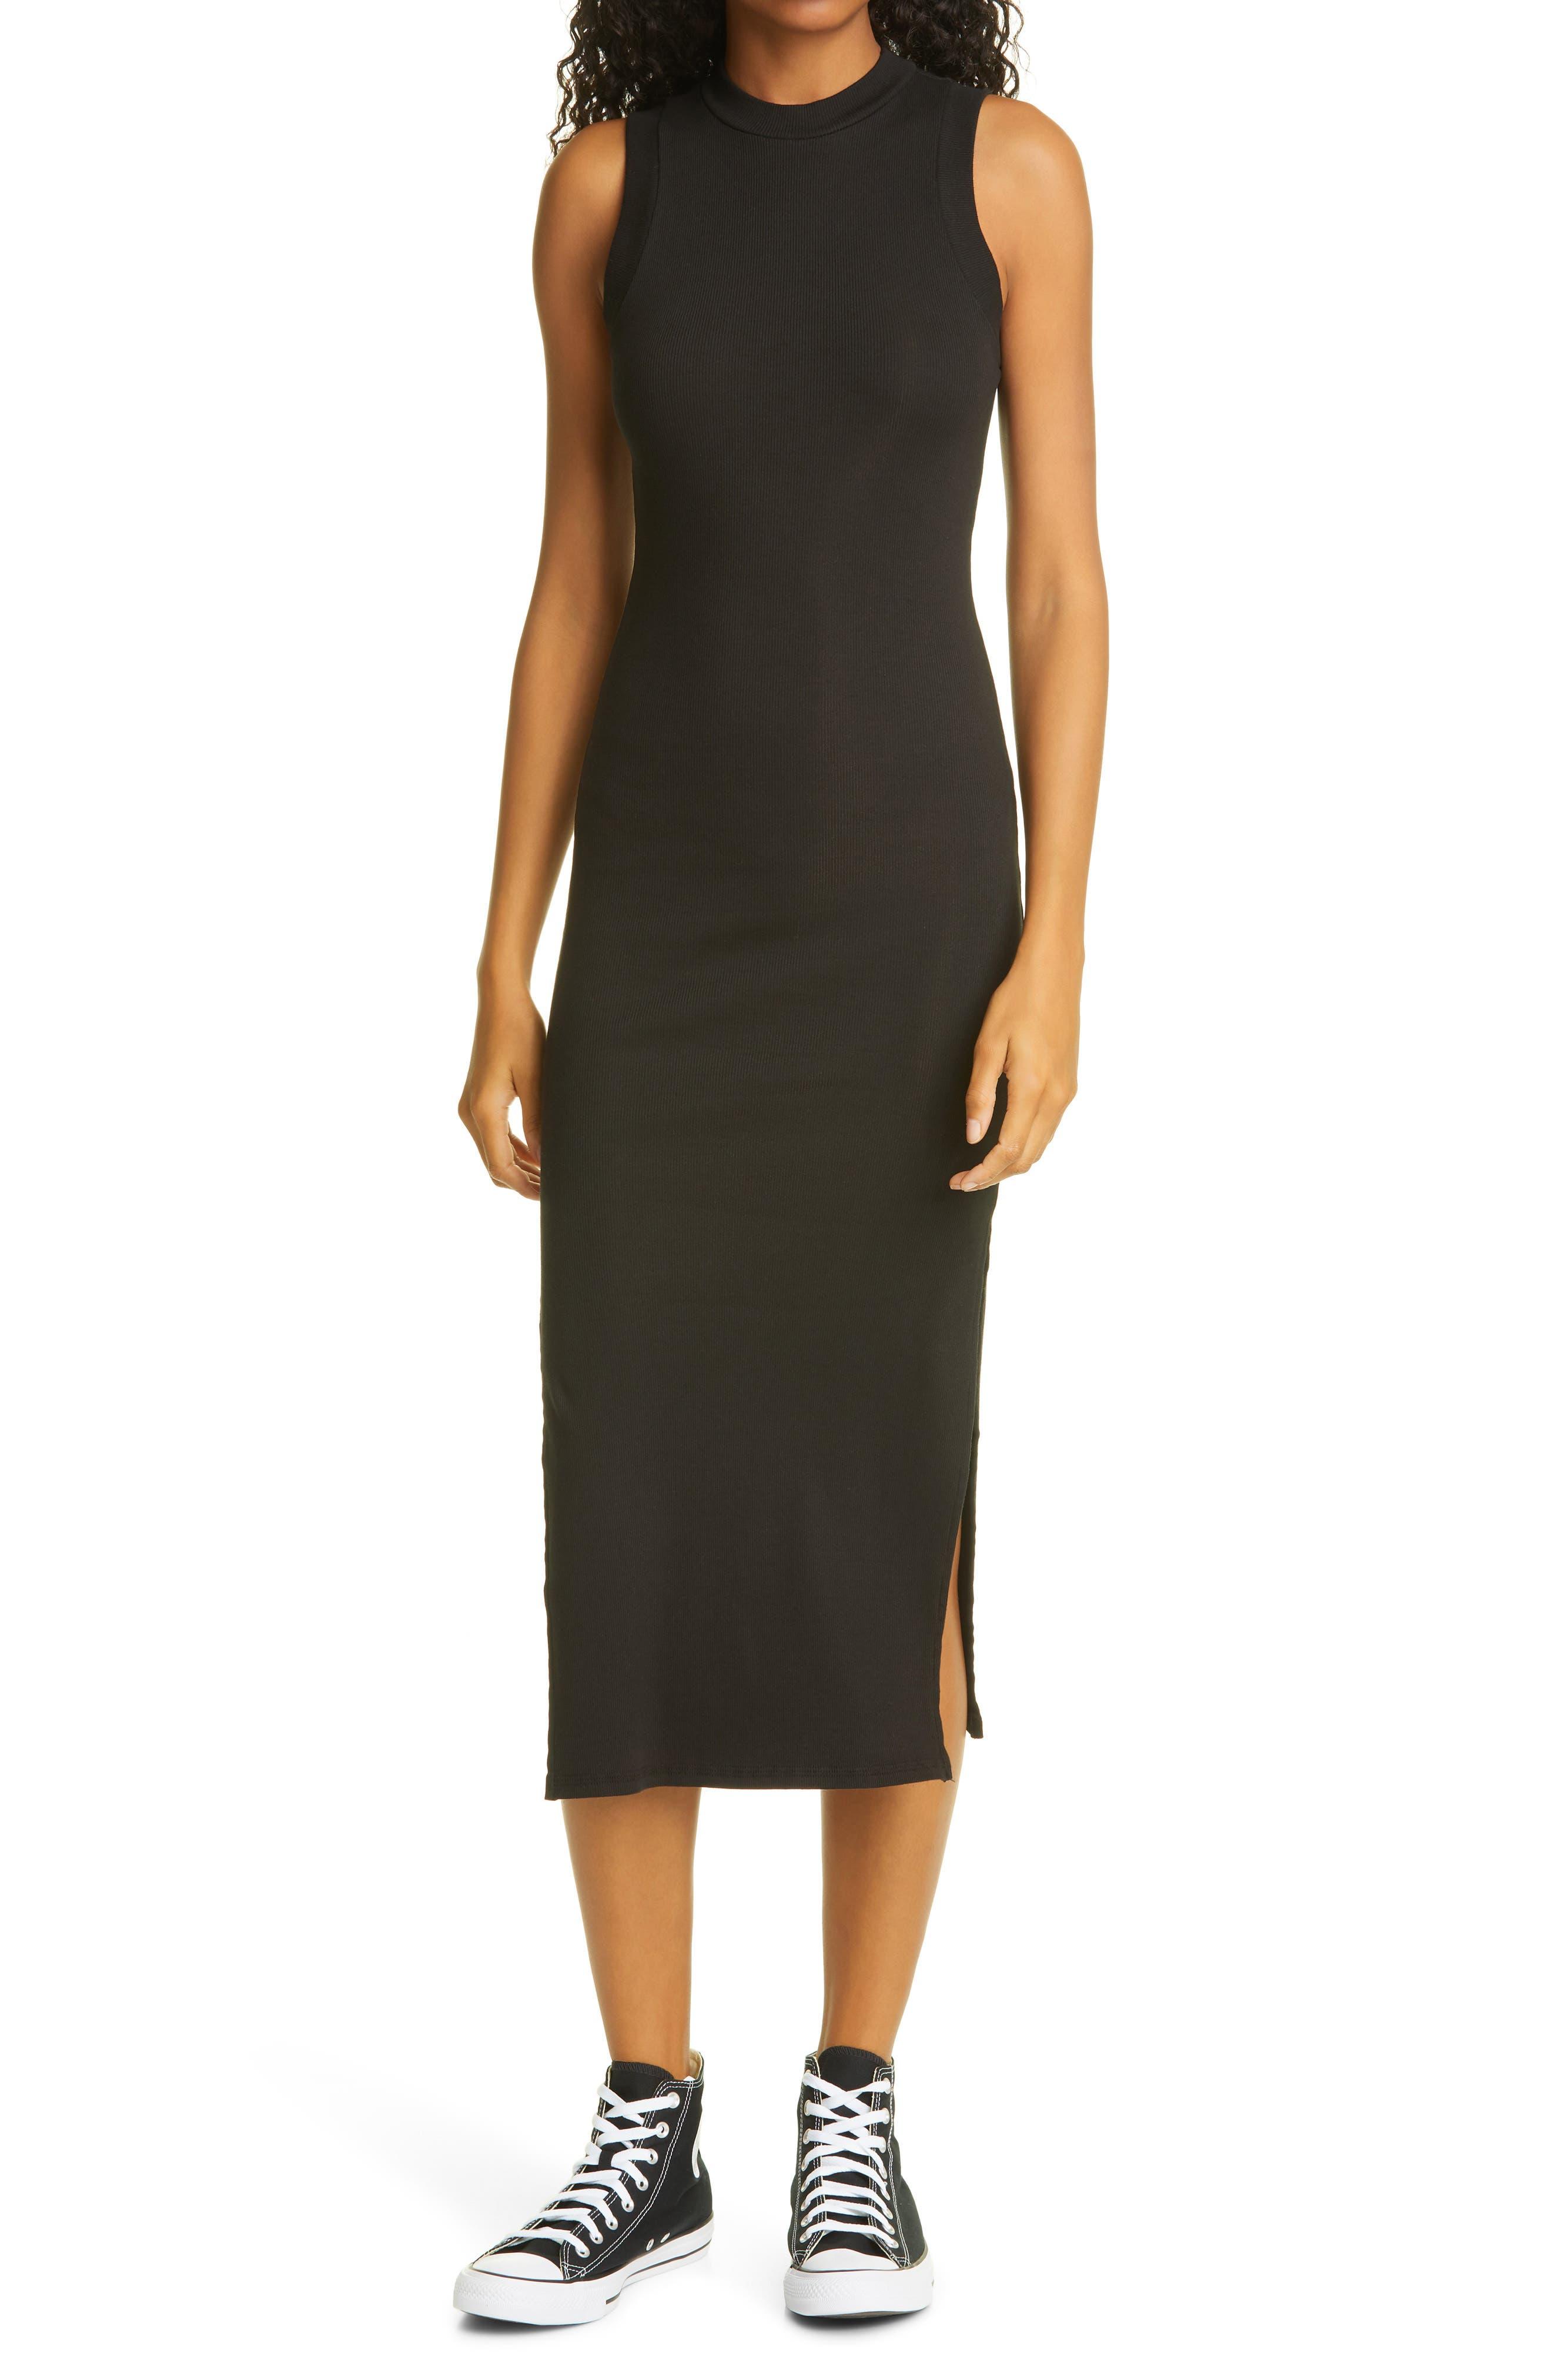 NSF Clothing Women's Nsf Clothing Sherry Sleeveless Stretch Cotton Midi Dress, Size Small - Black